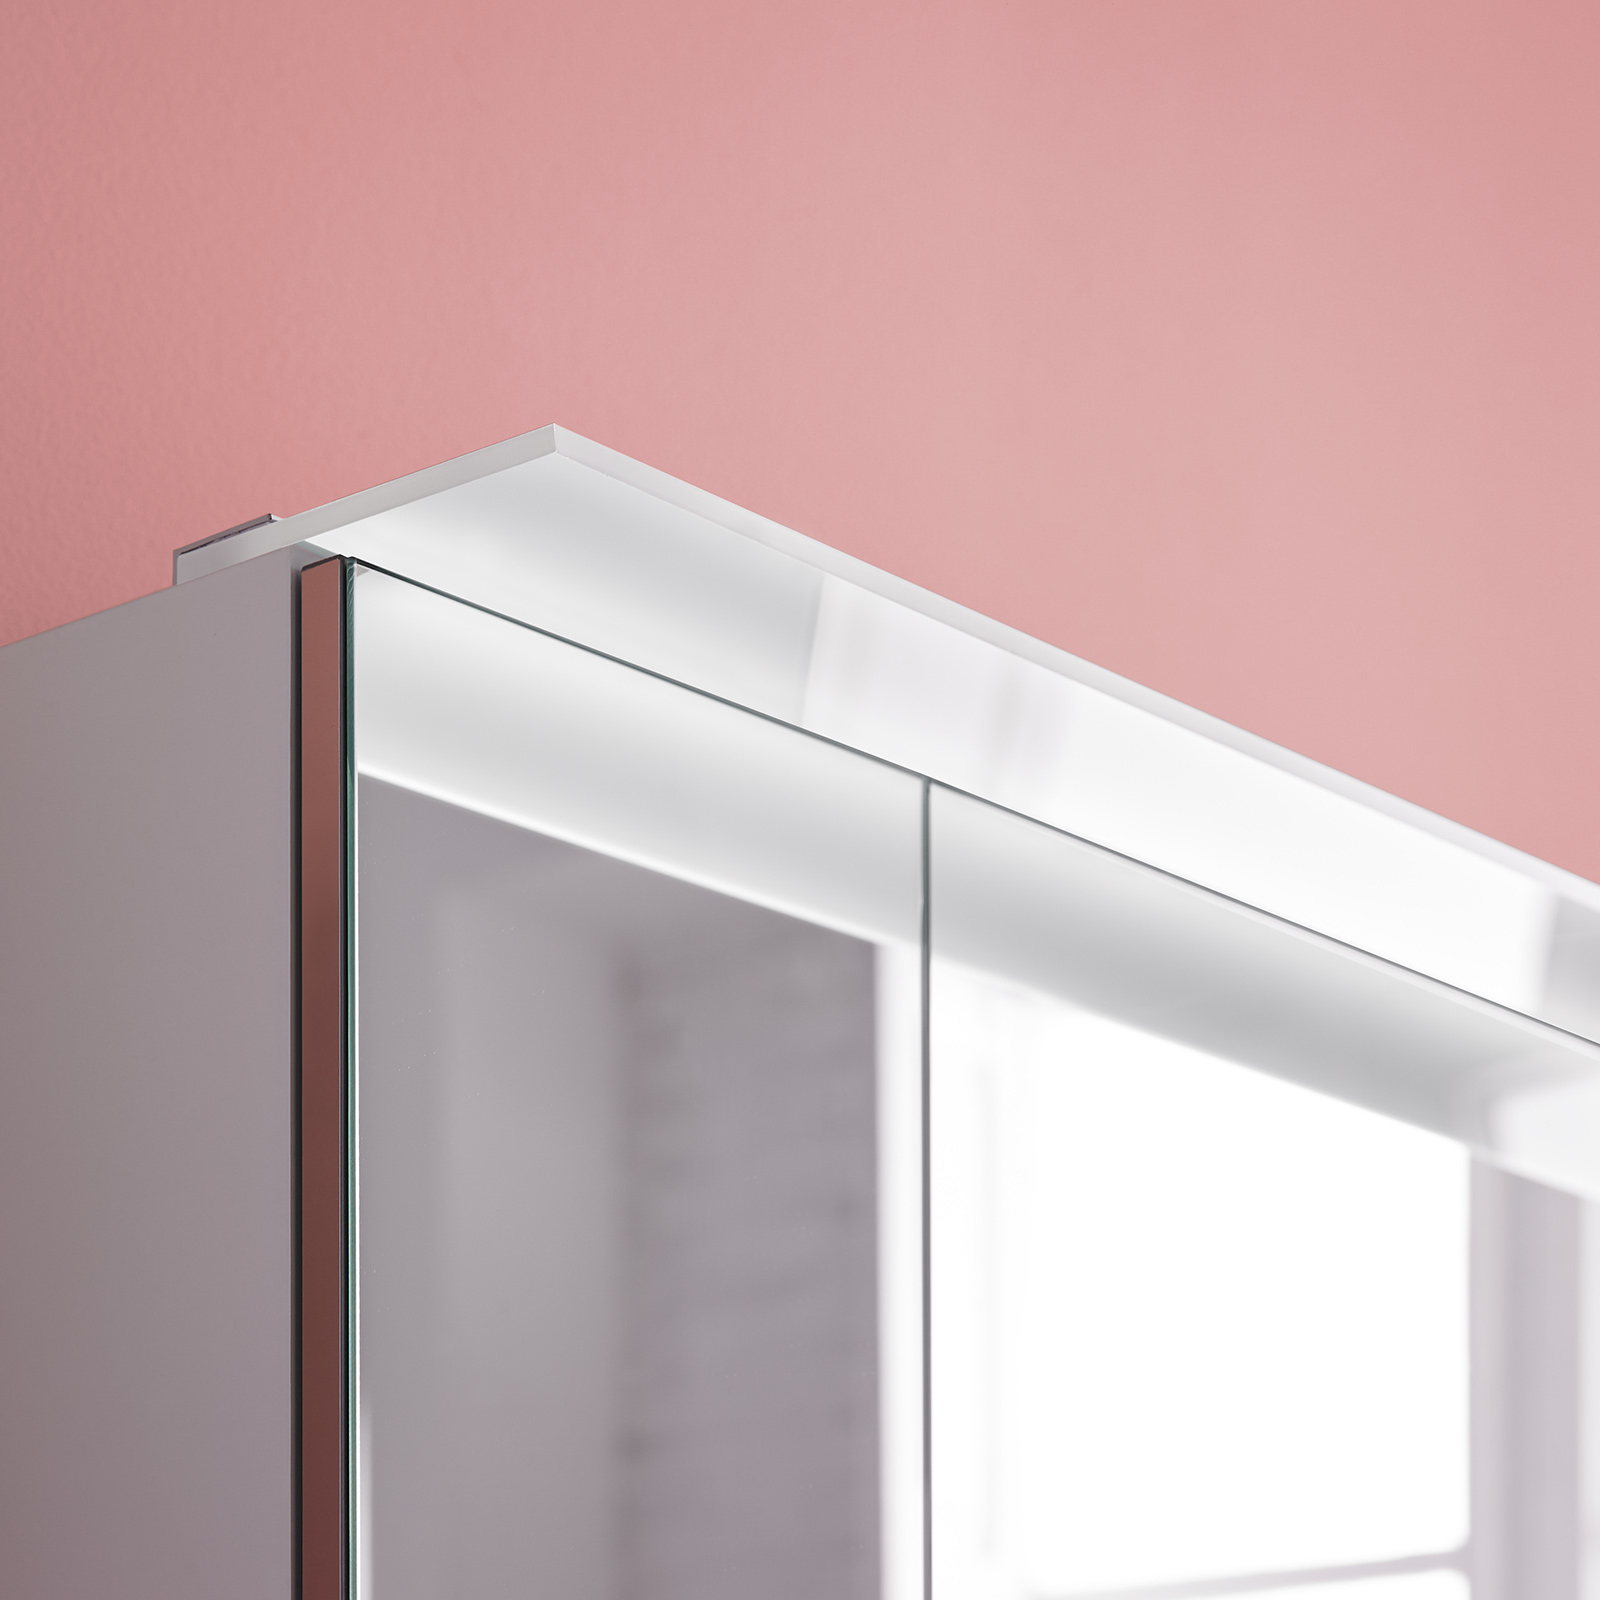 LED-möbelpåbyggnadslampa Adele, bredd 60 cm